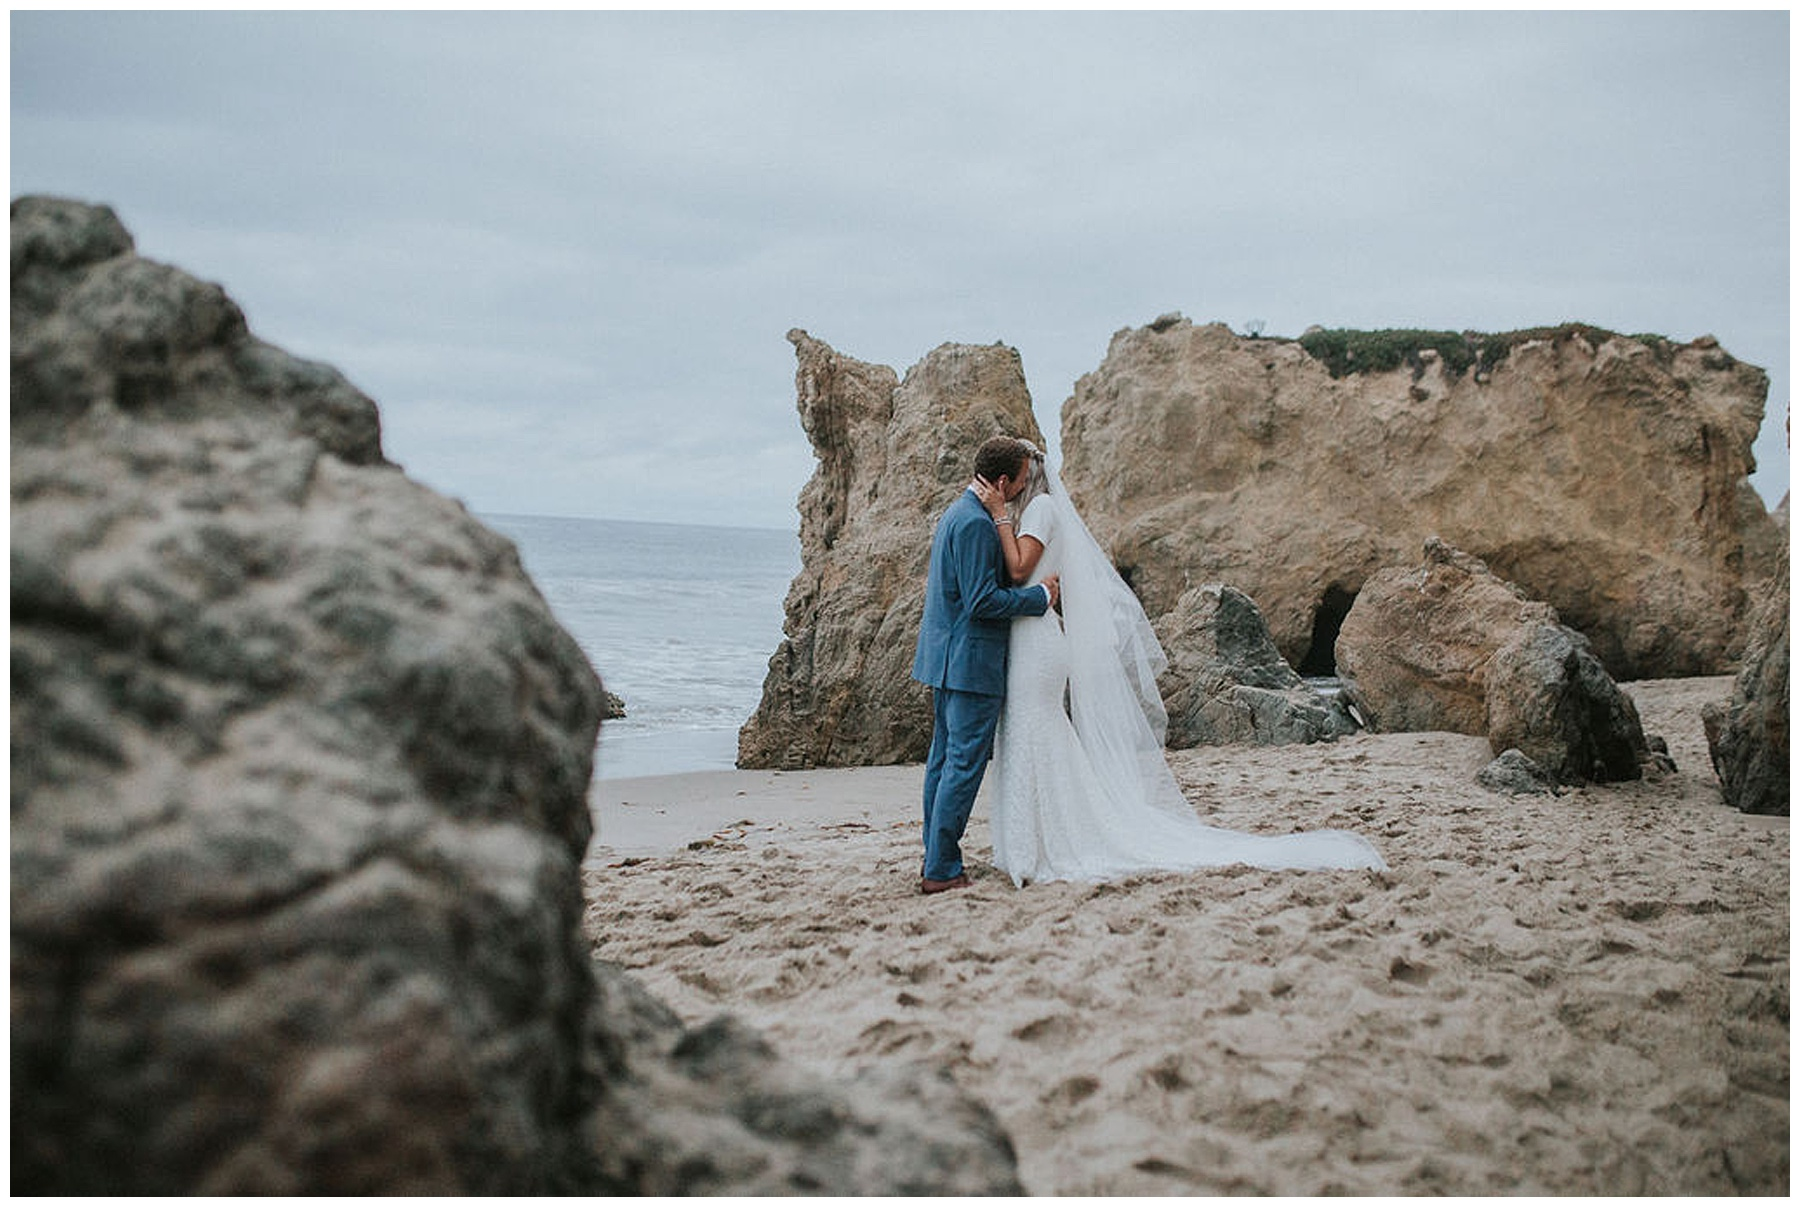 el-matador-state-beach-los-angeles-wedding-look-for-the-light